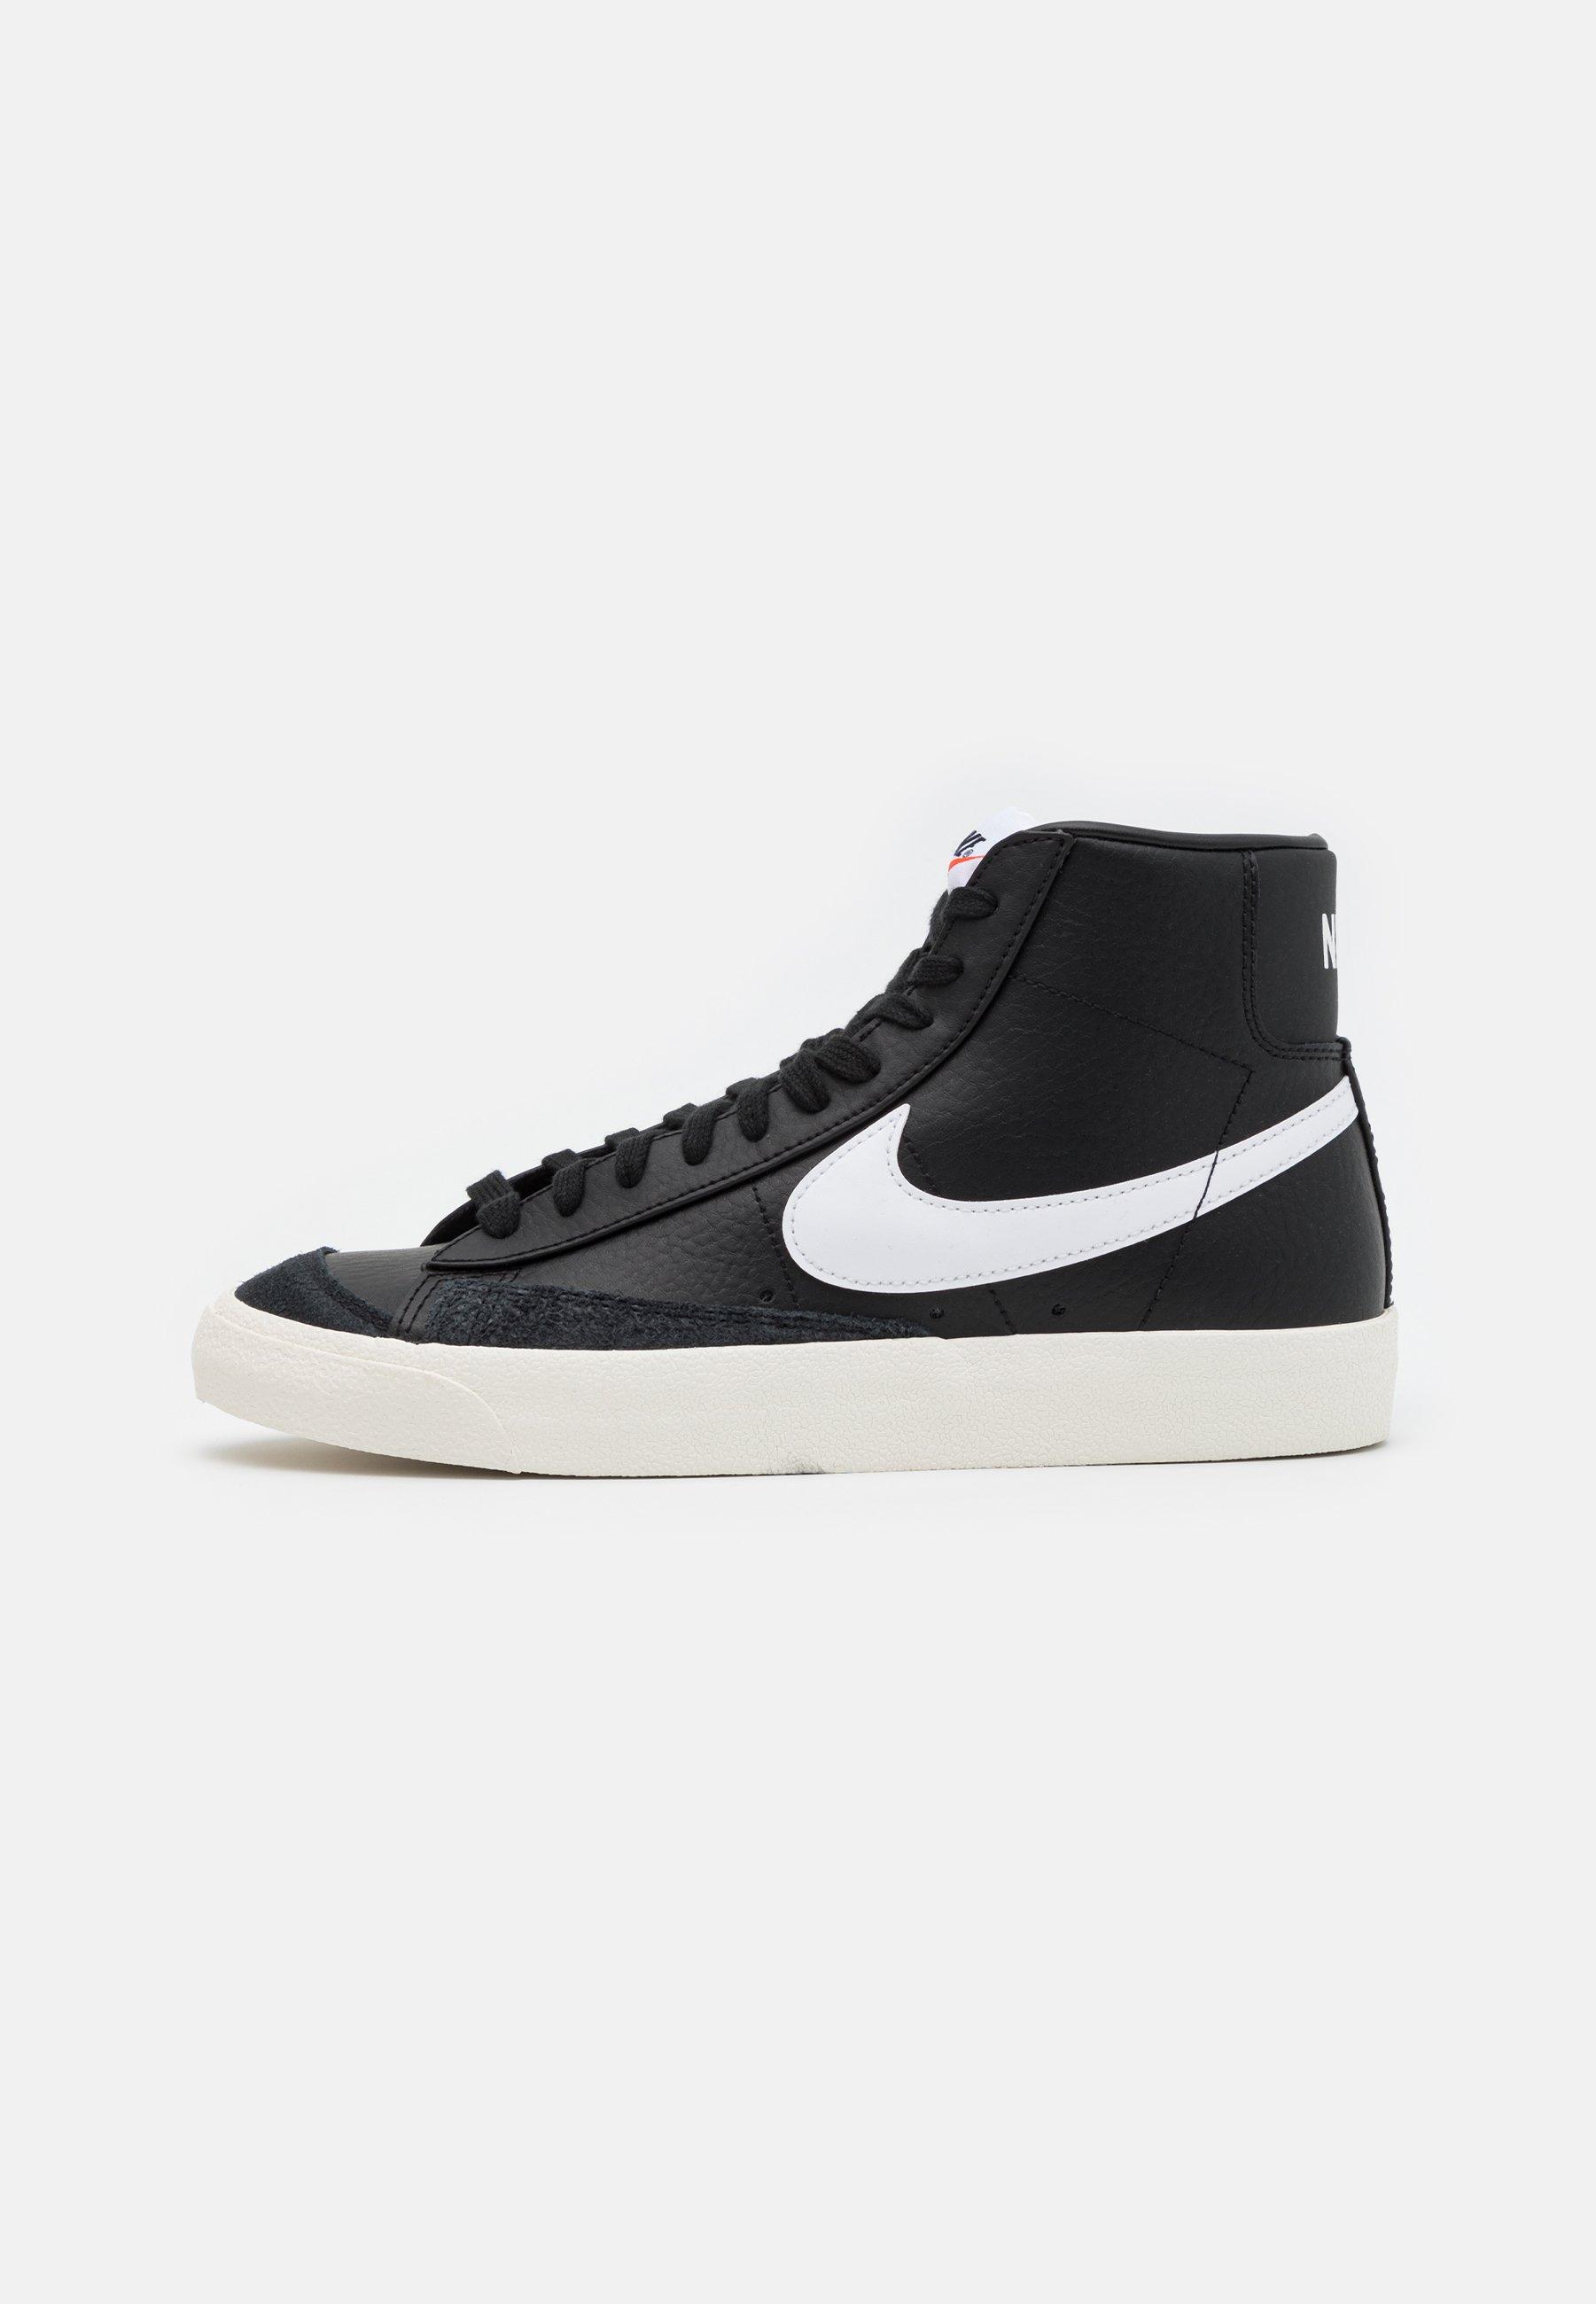 nike zapatillas altas negras